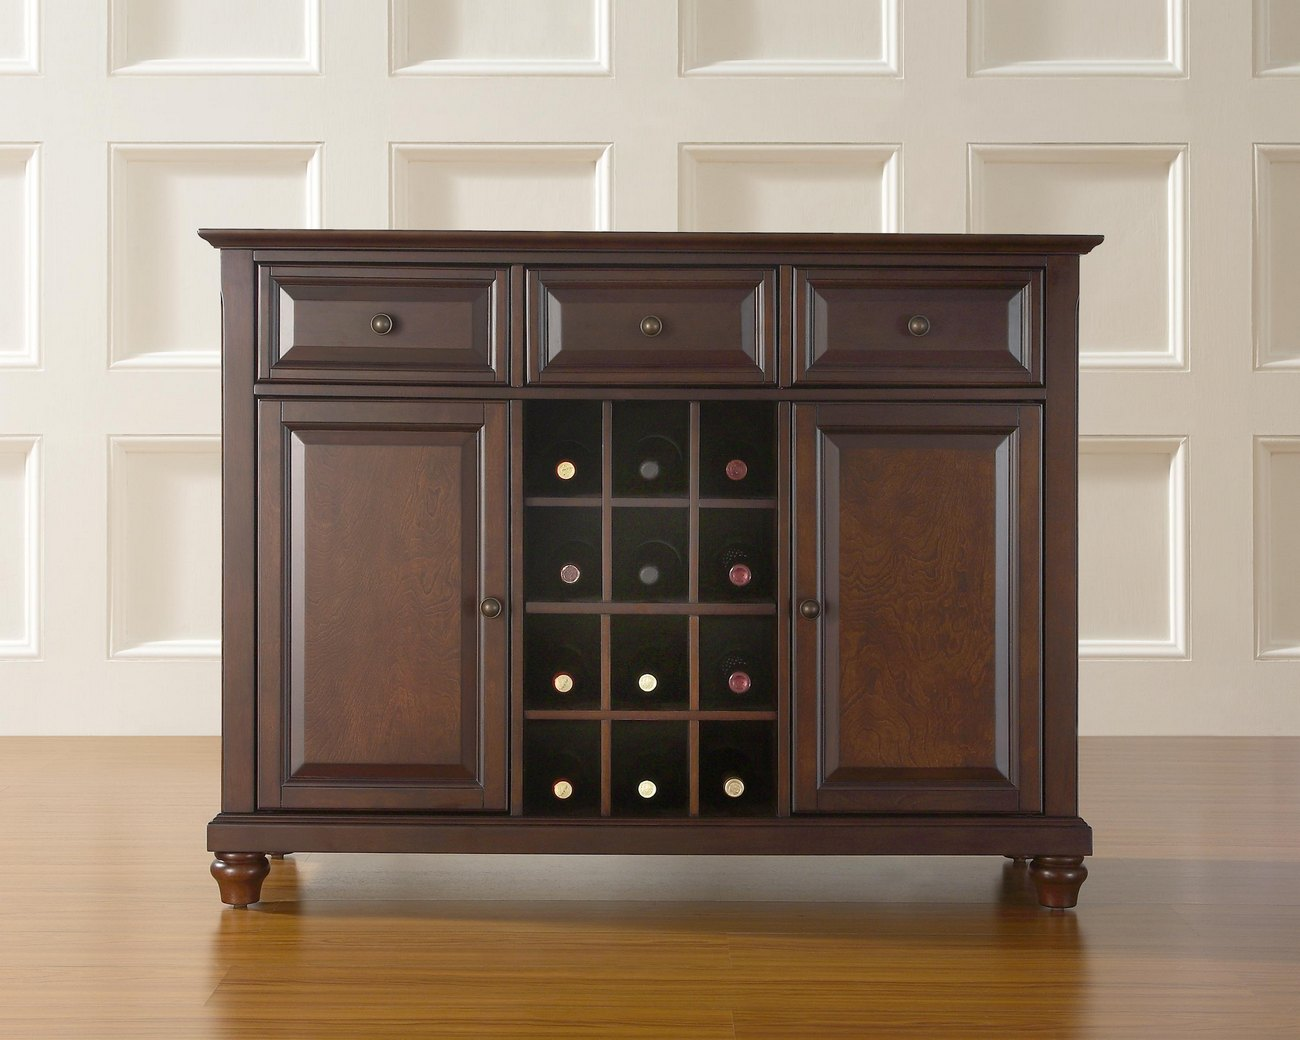 Picture of: Cambridge Buffet Server Sideboard Cabinet W Wine Storage In Vintage Mahogany Finish Crosley Kf42001dma